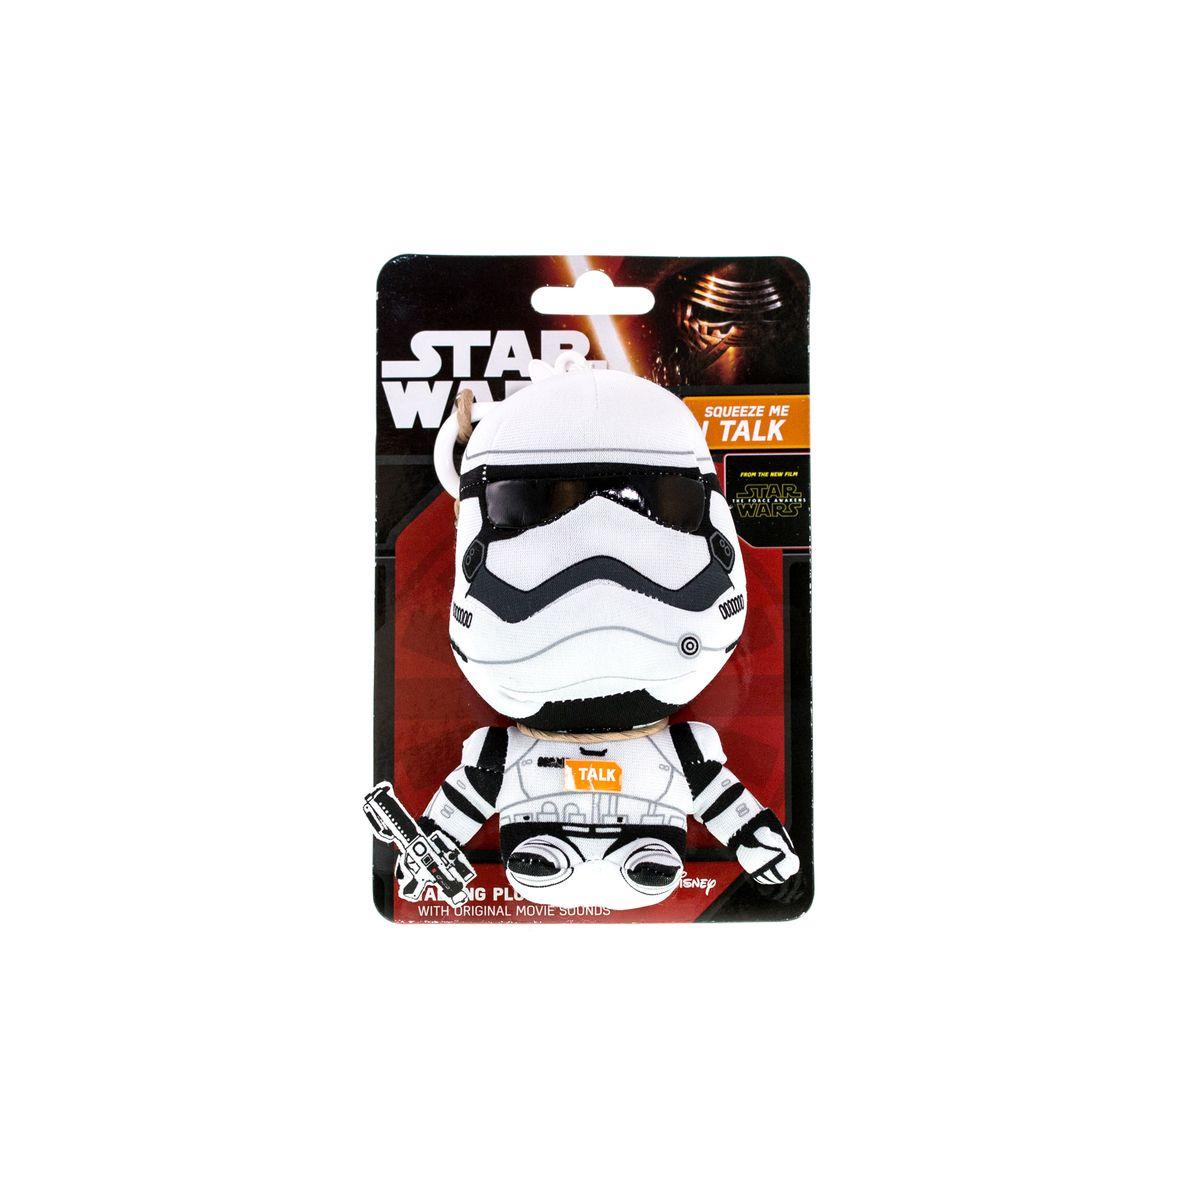 Star Wars Мягкая игрушка-брелок Штурмовик